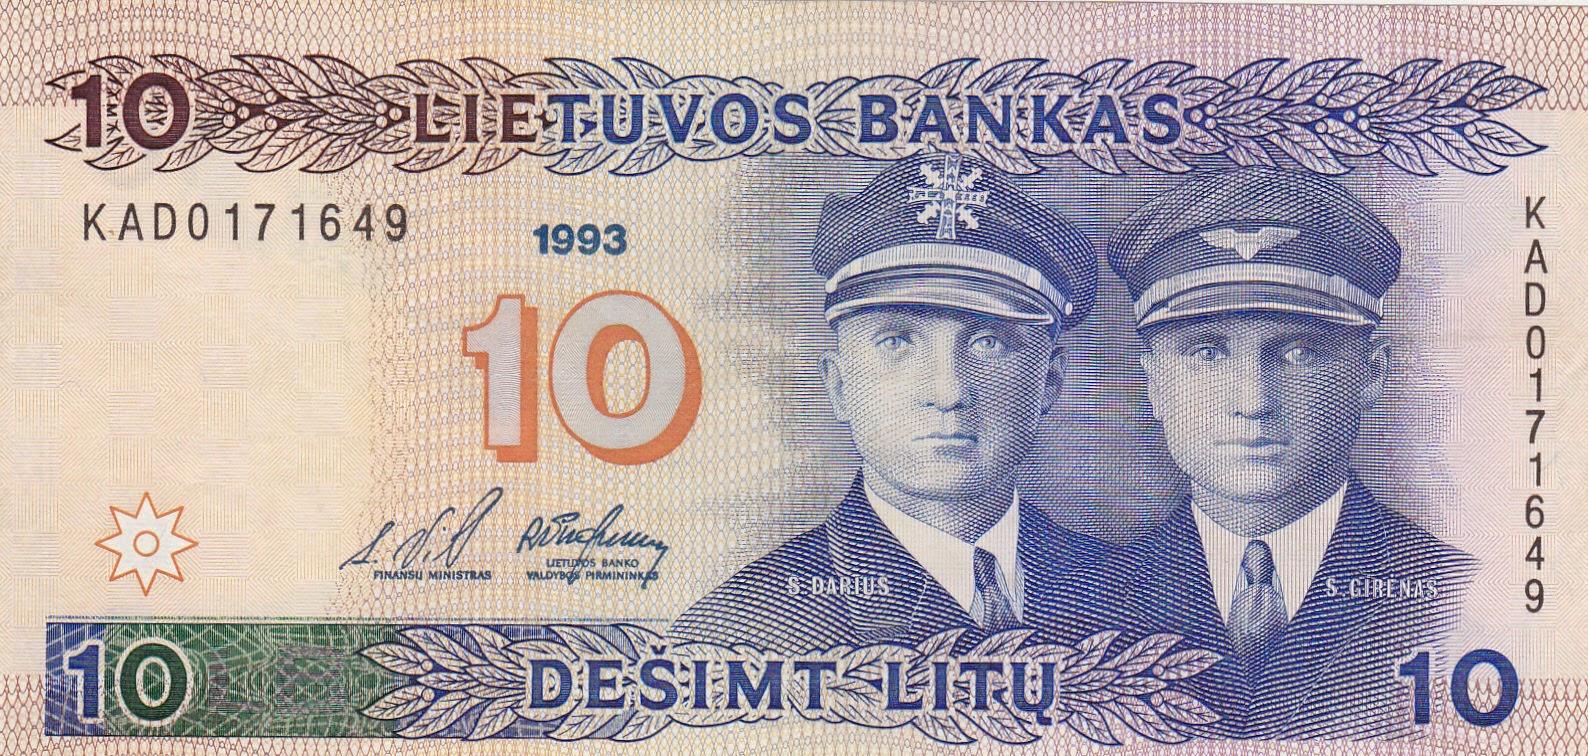 Lithuania banknotes 10 Litu banknote 1993 Lithuanian pilots: Steponas Darius and Stasys Girėnas